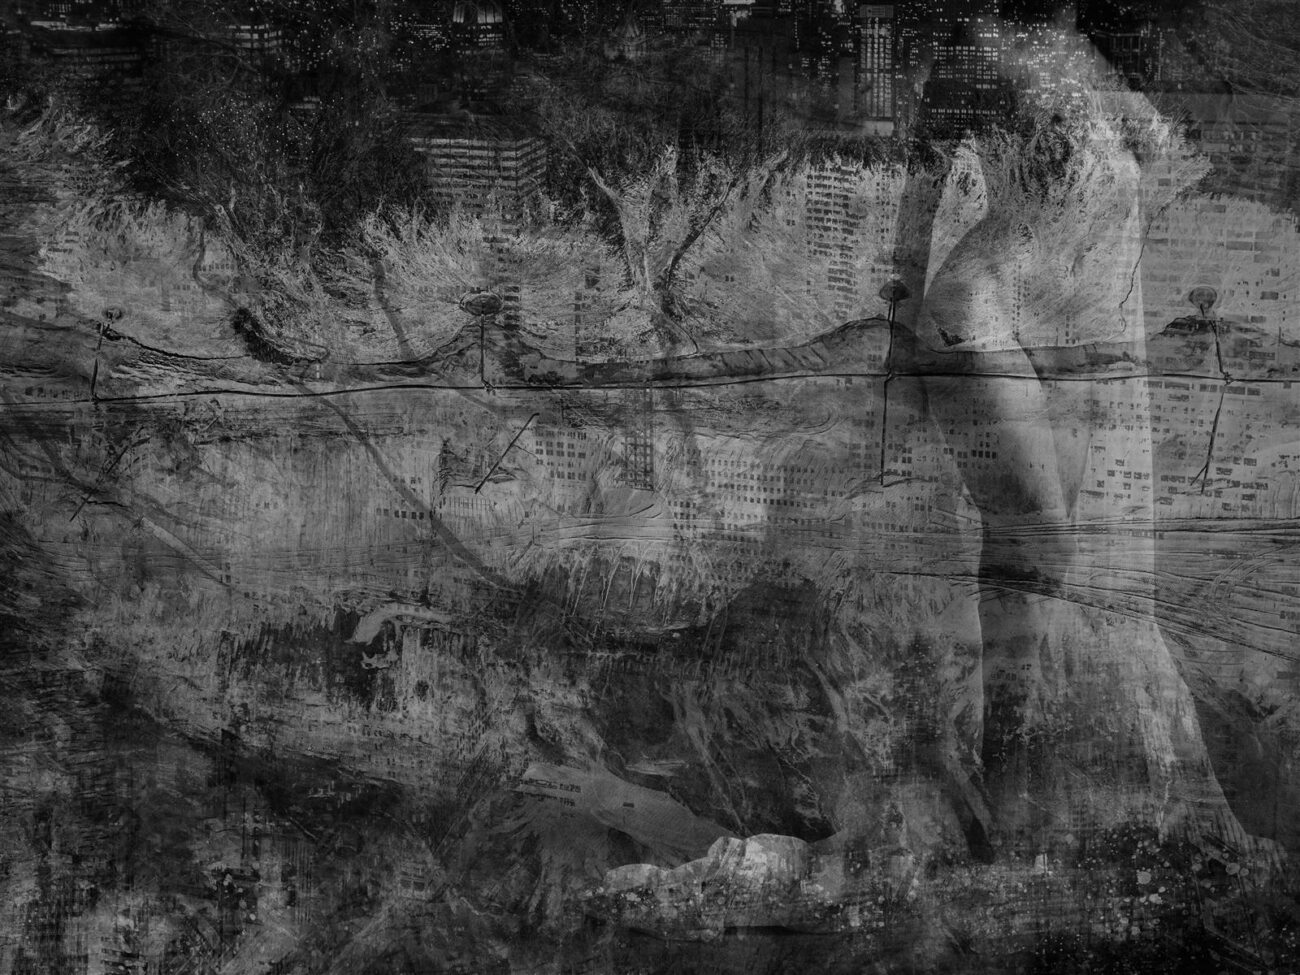 Steph, digital collage, original digital UV print up to 120x160cm, 2017